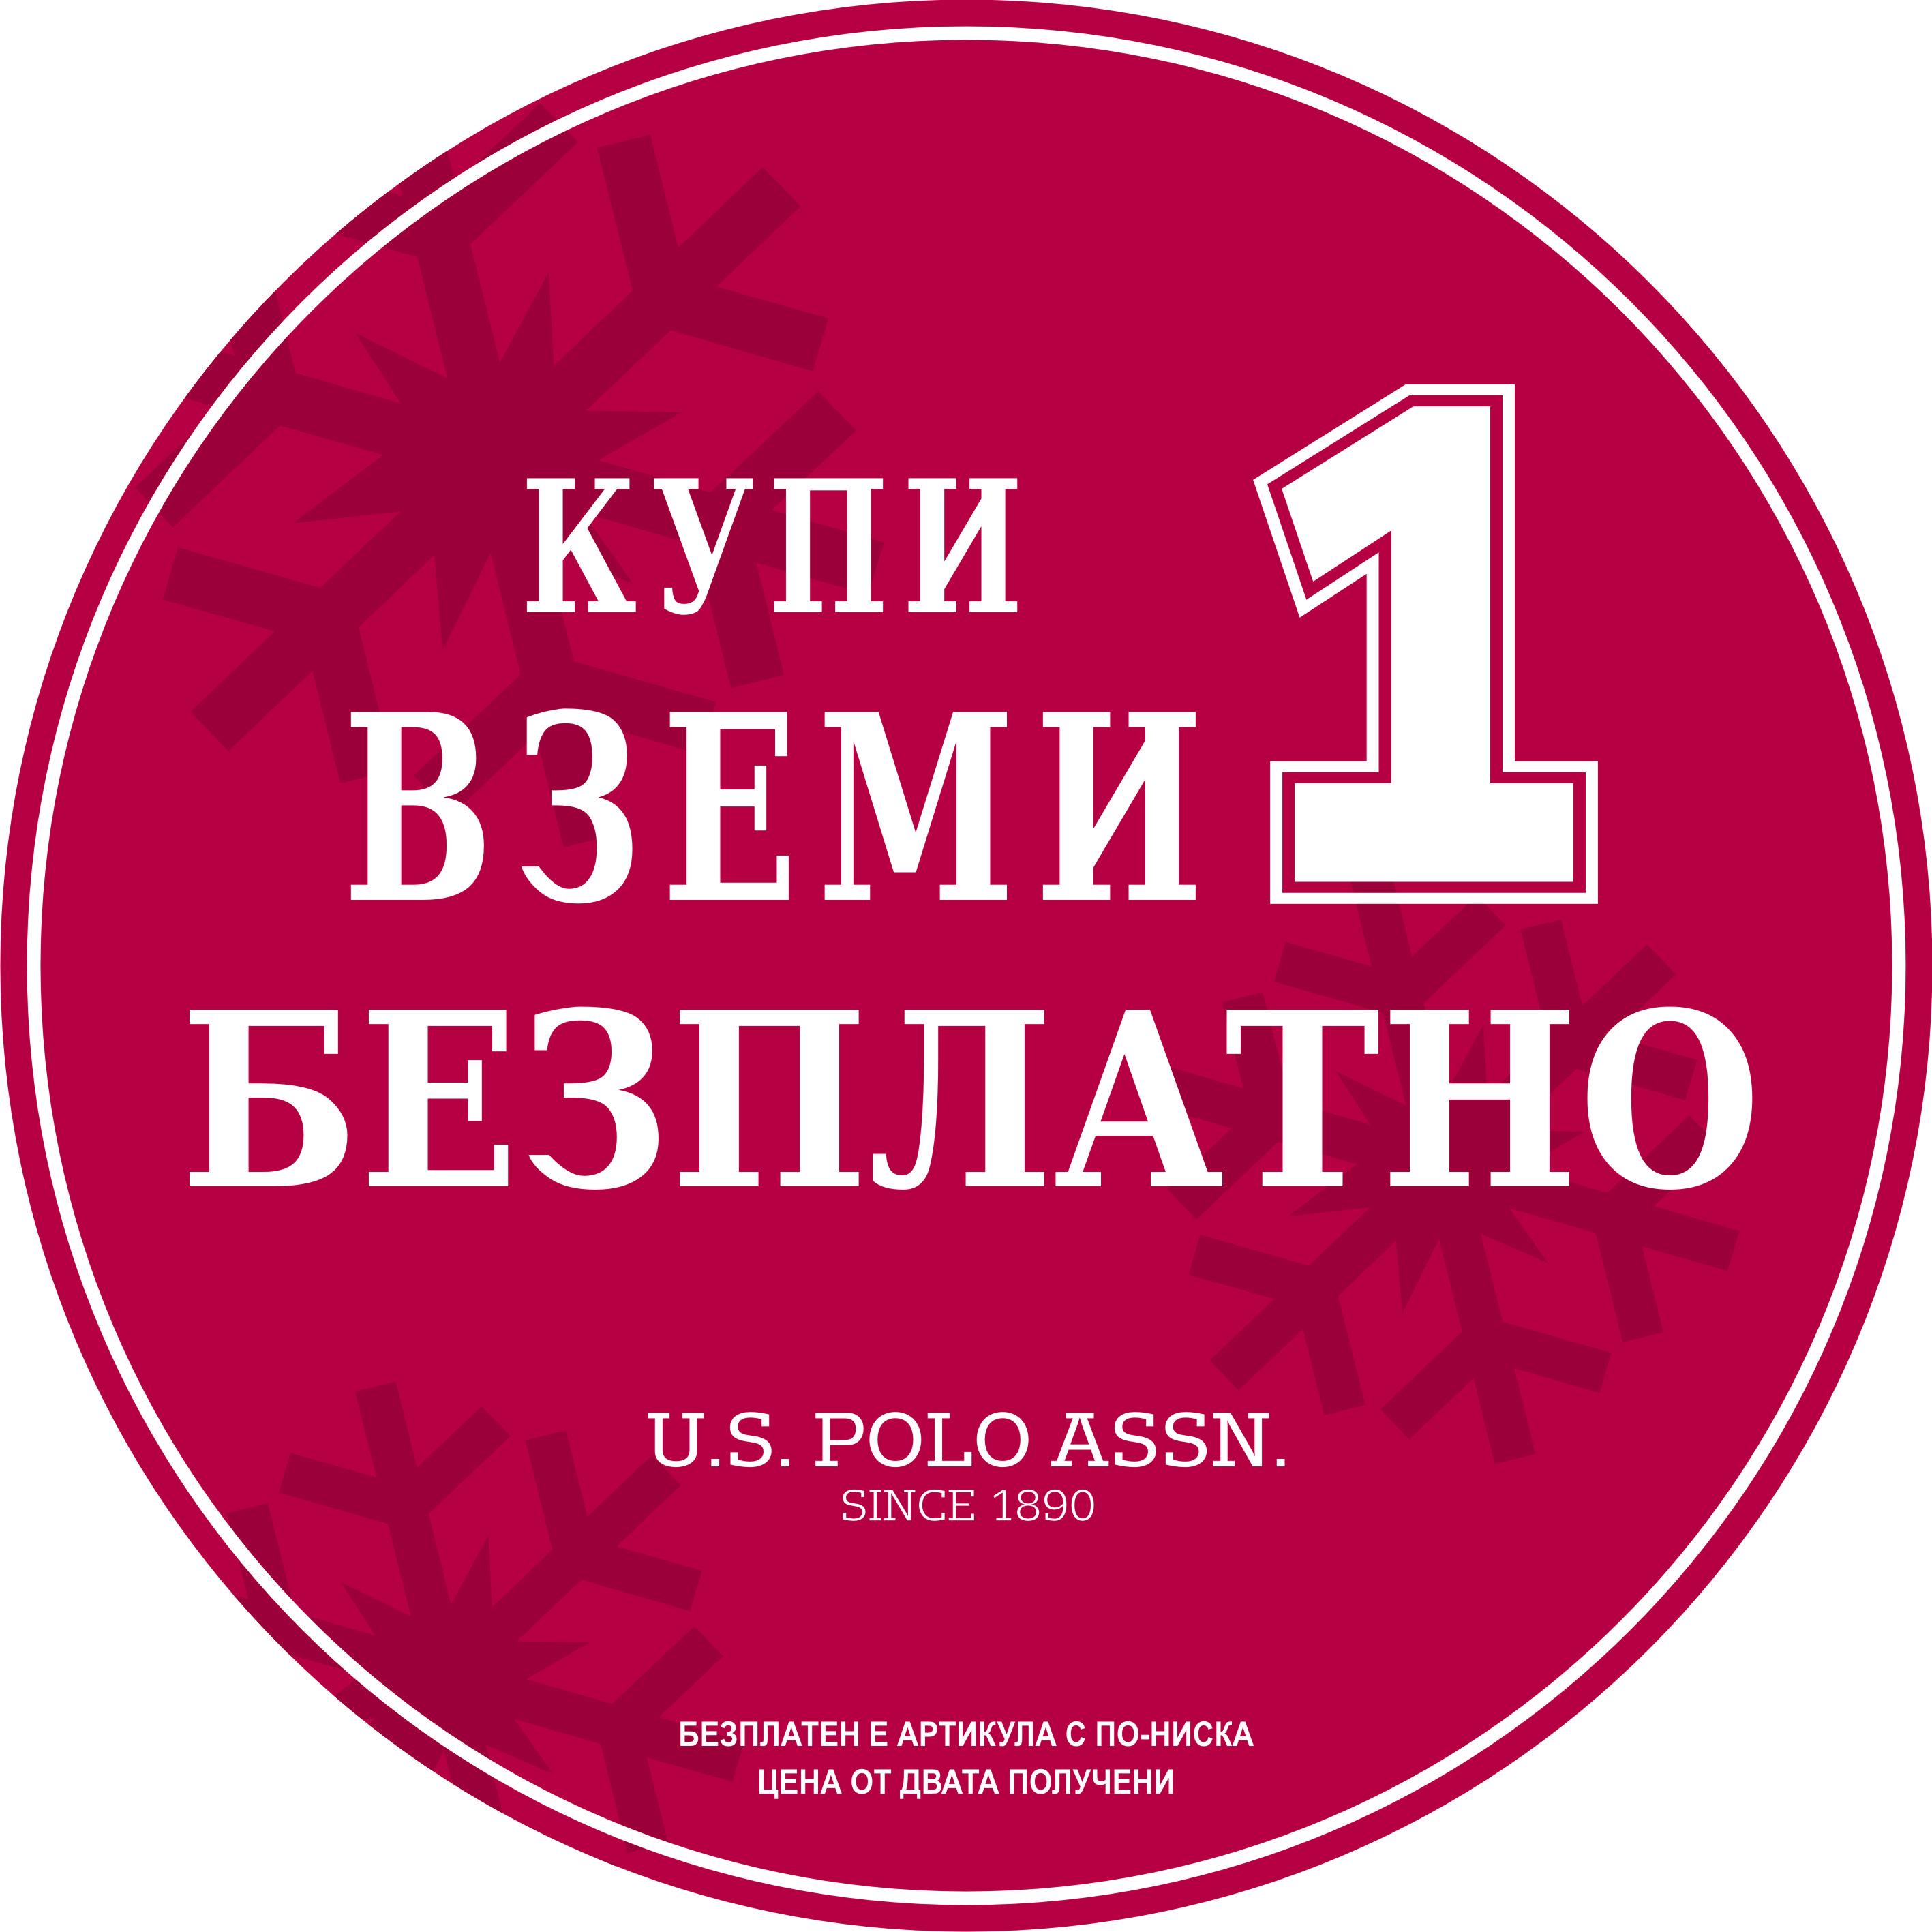 Супер промоция от US POLO ASSN